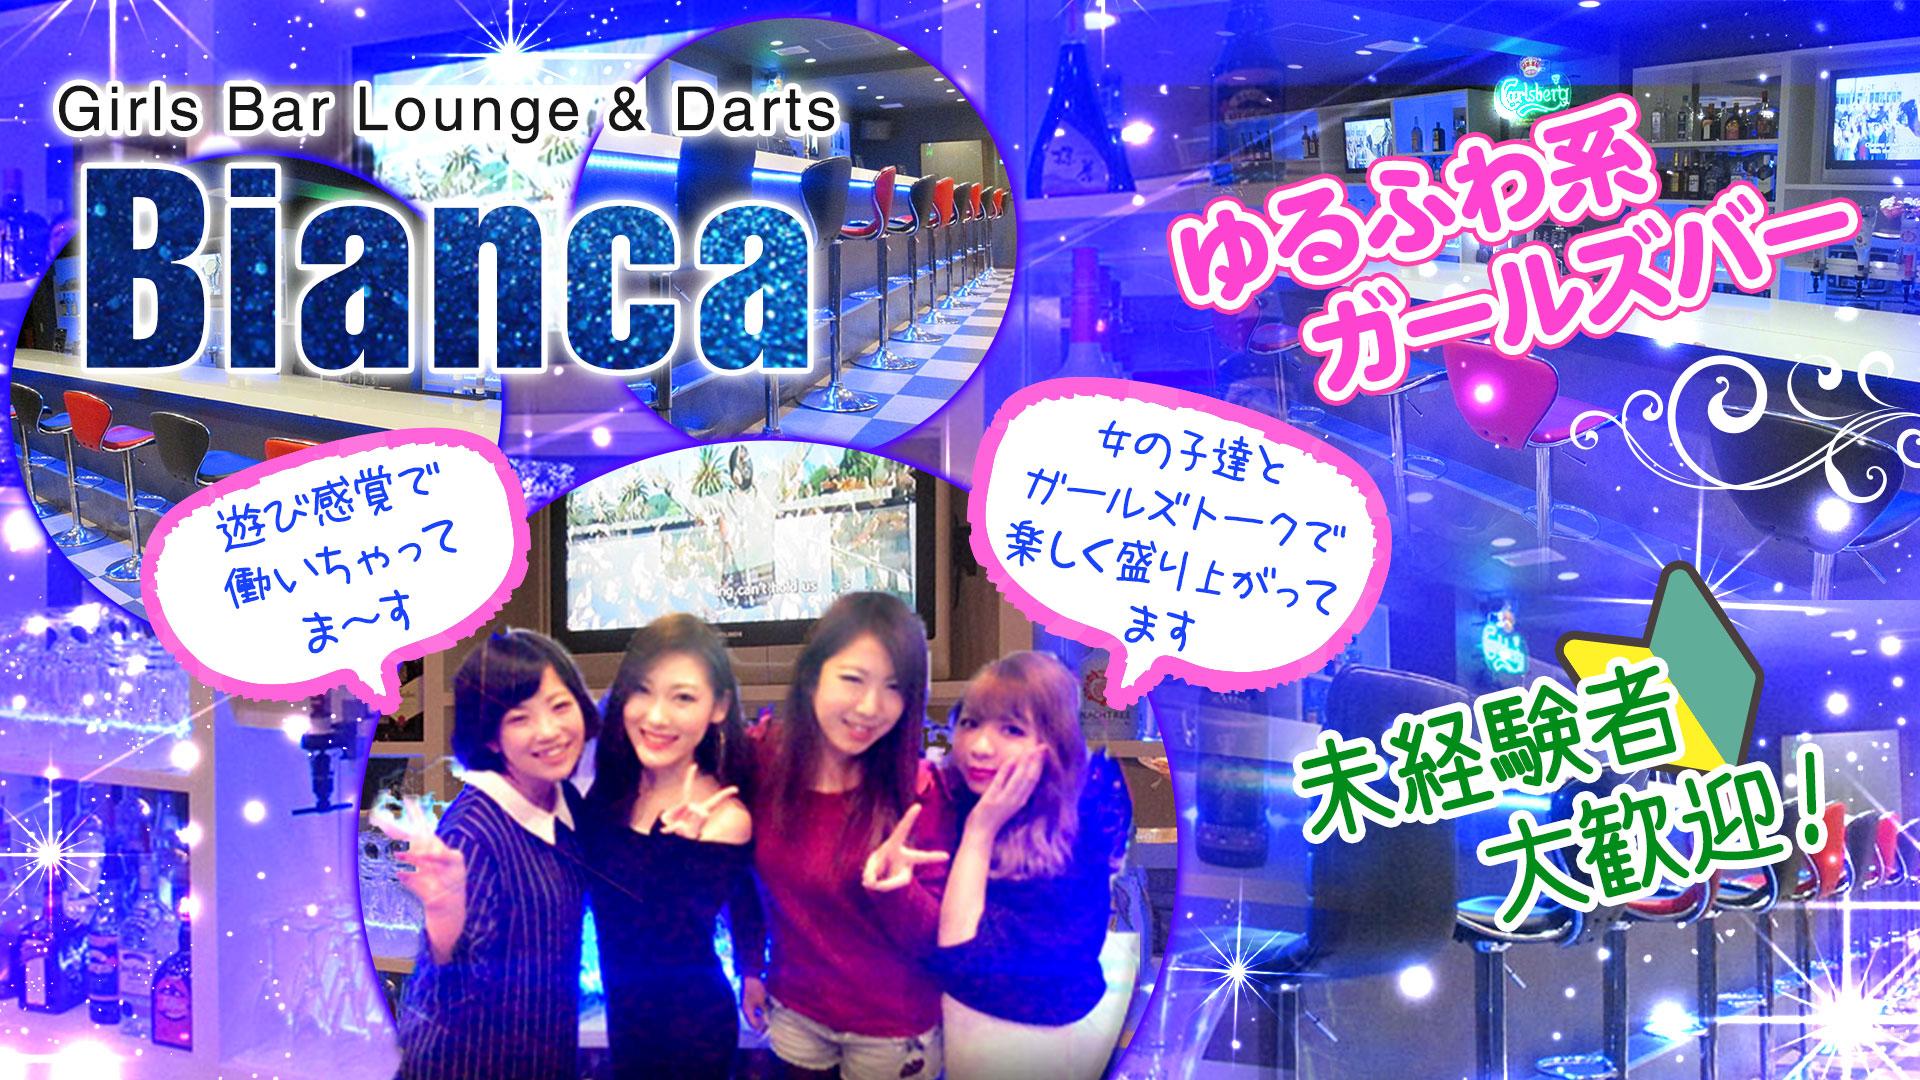 Girls Bar Lounge & Darts -Bianca-<ビアンカ> 川崎 ガールズバー TOP画像